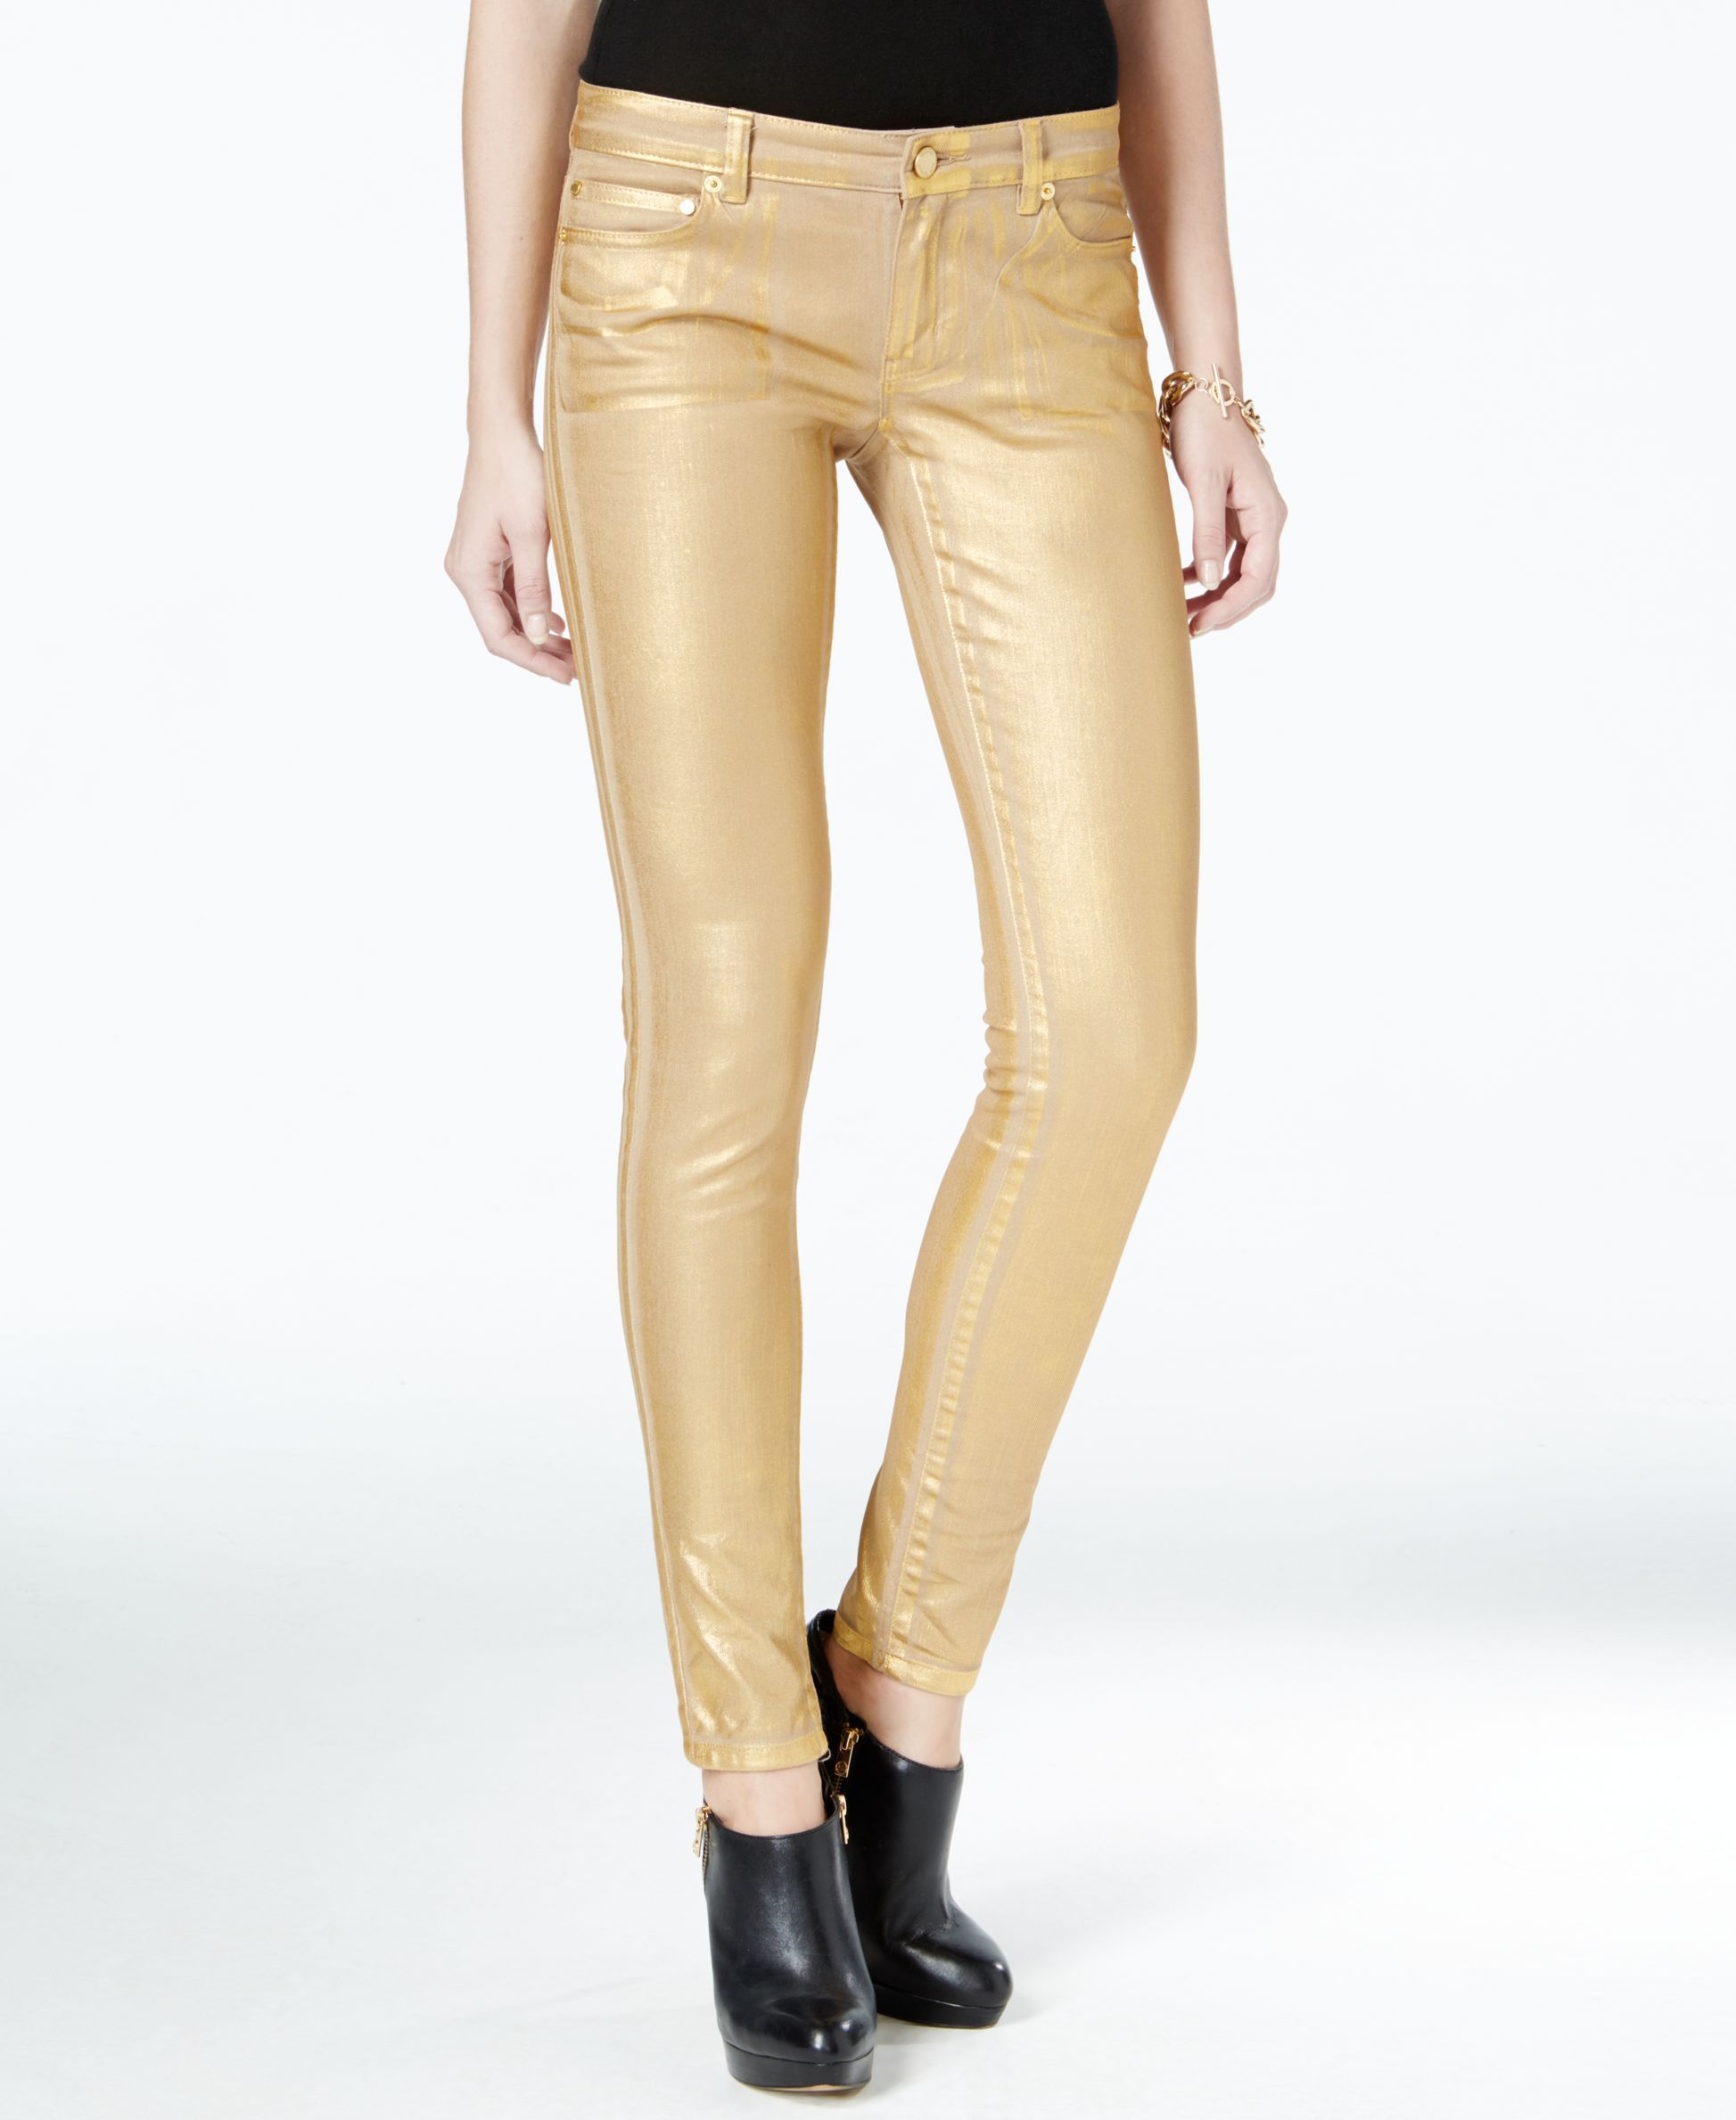 6a9eee90cbe95 Michael Michael Kors Metallic Gold Wash Skinny Jeans